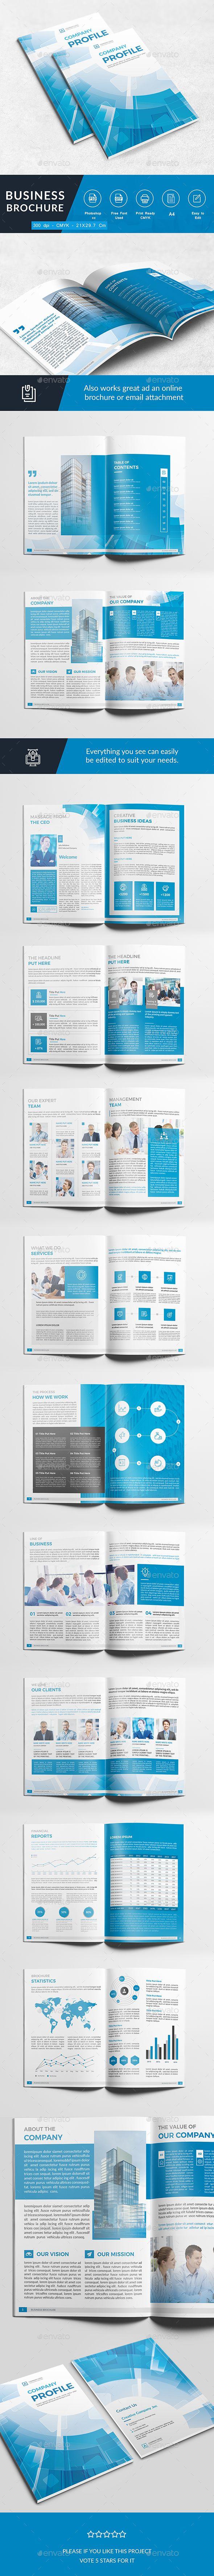 Company Profile  — PSD Template #inspiration #proposal #annual report • Download ➝ https://graphicriver.net/item/company-profile/18600050?ref=pxcr